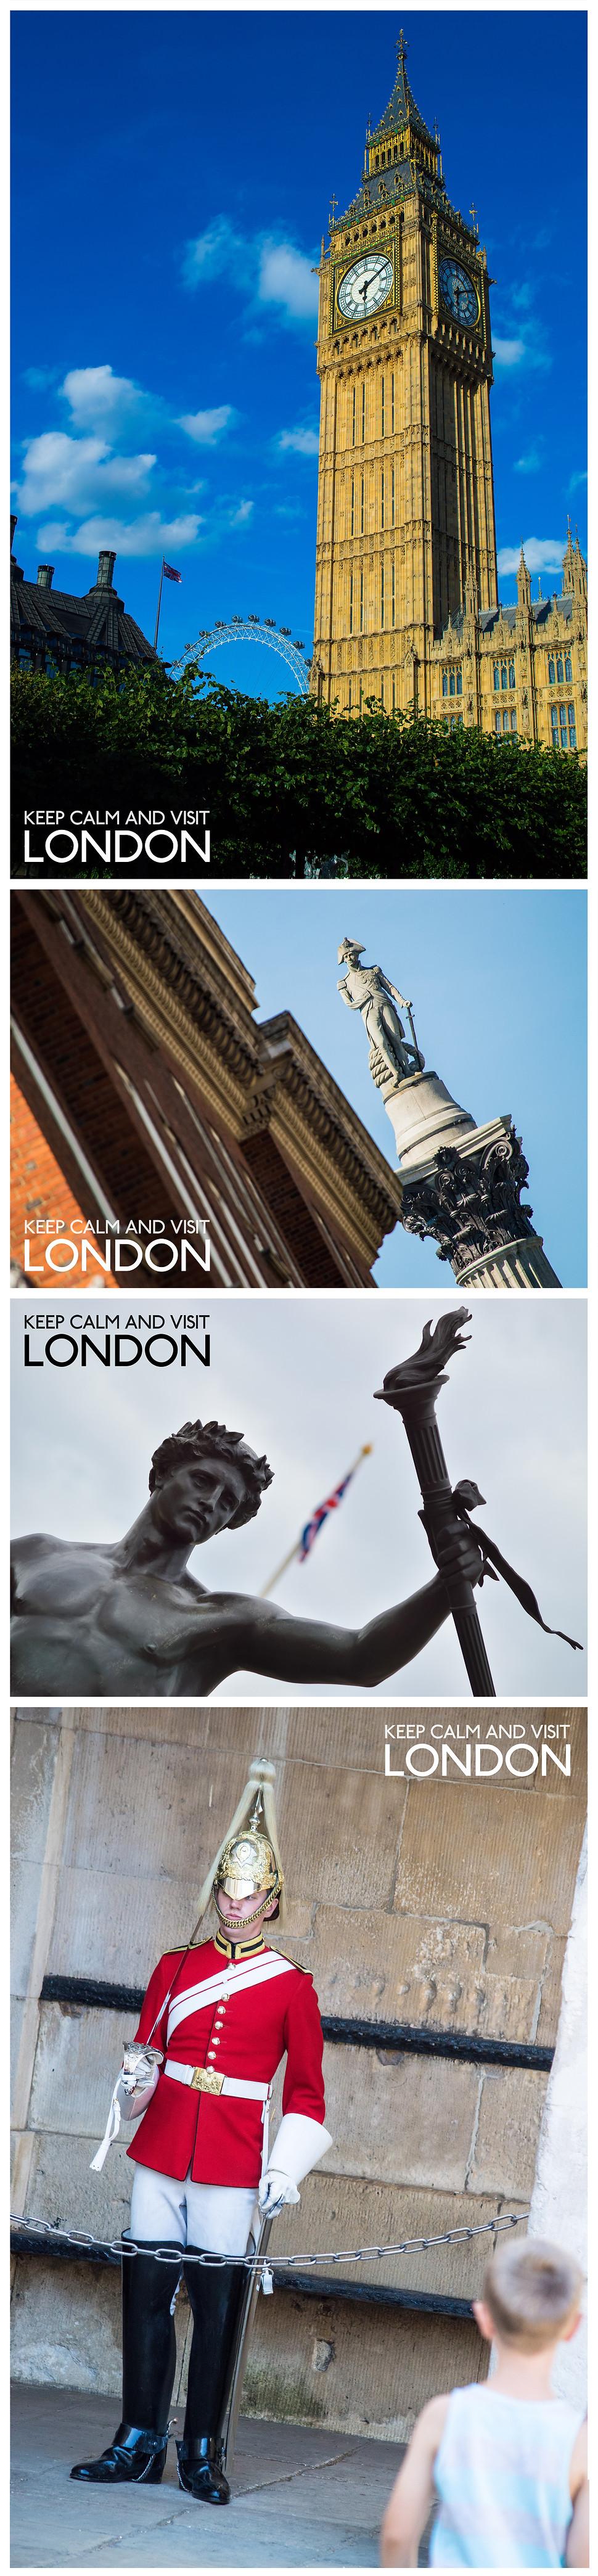 London small.jpg